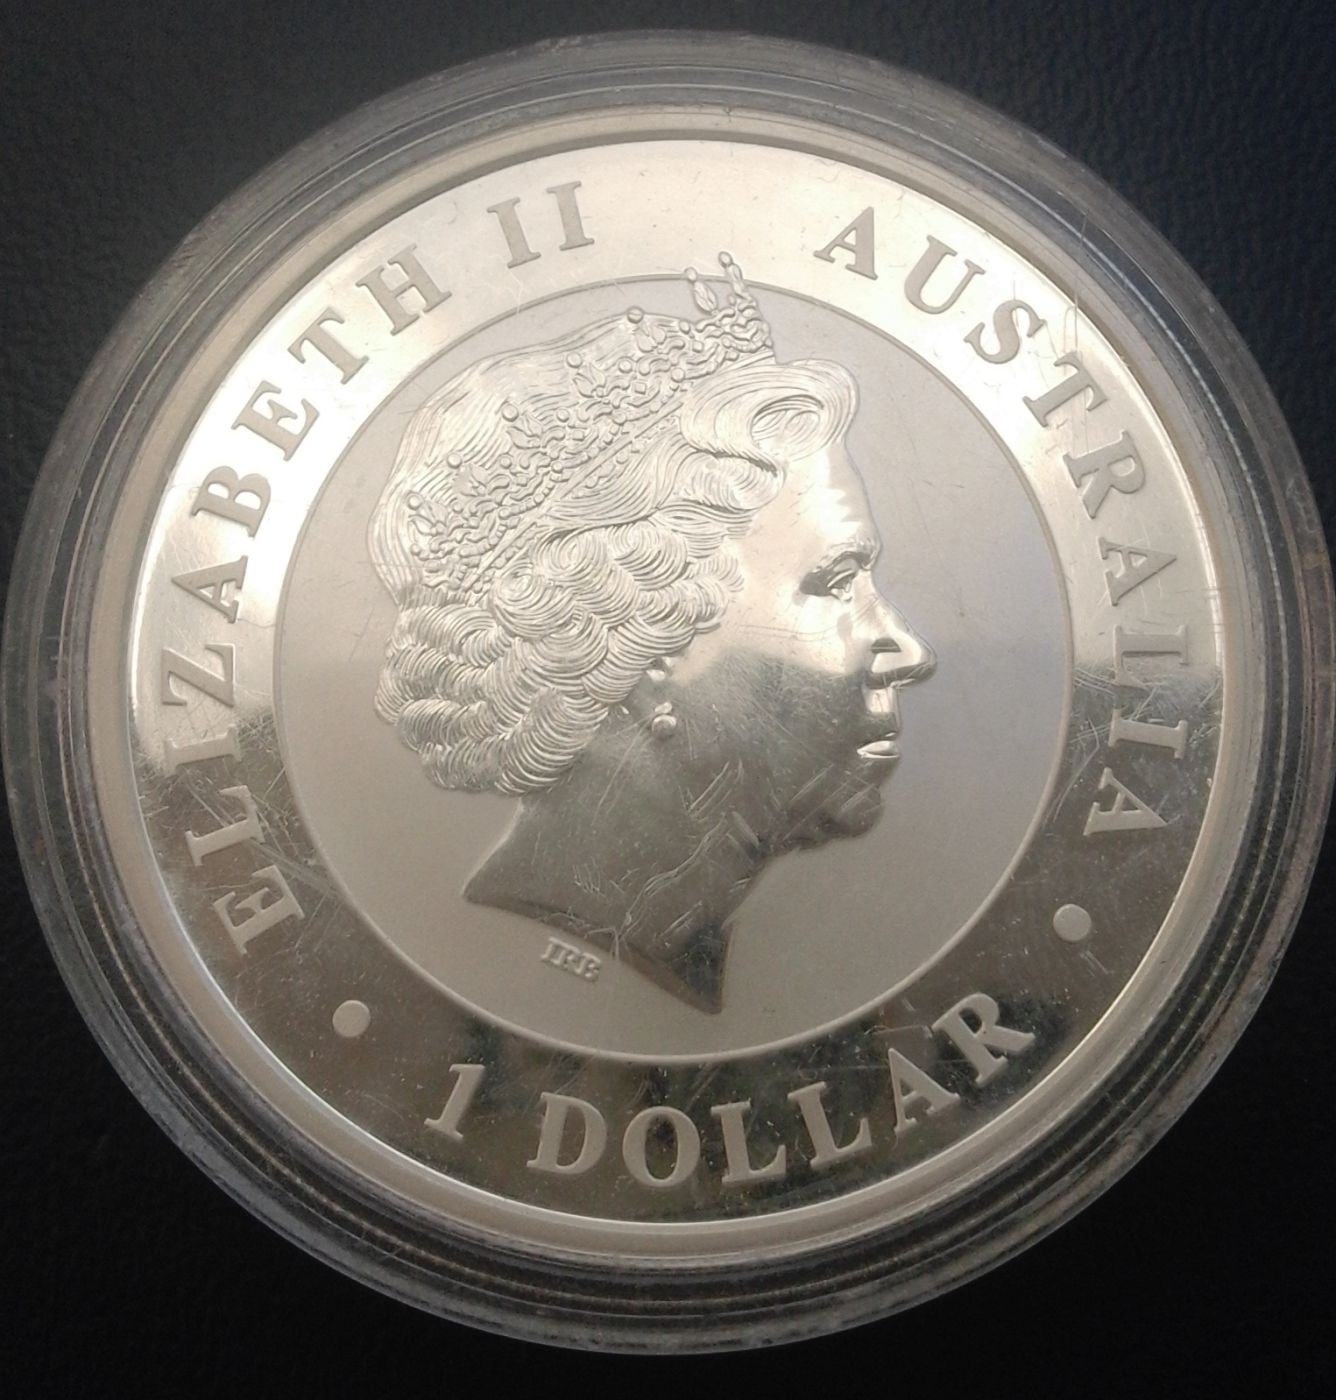 1 Dollar 2016 Koala Investment Koala Australia